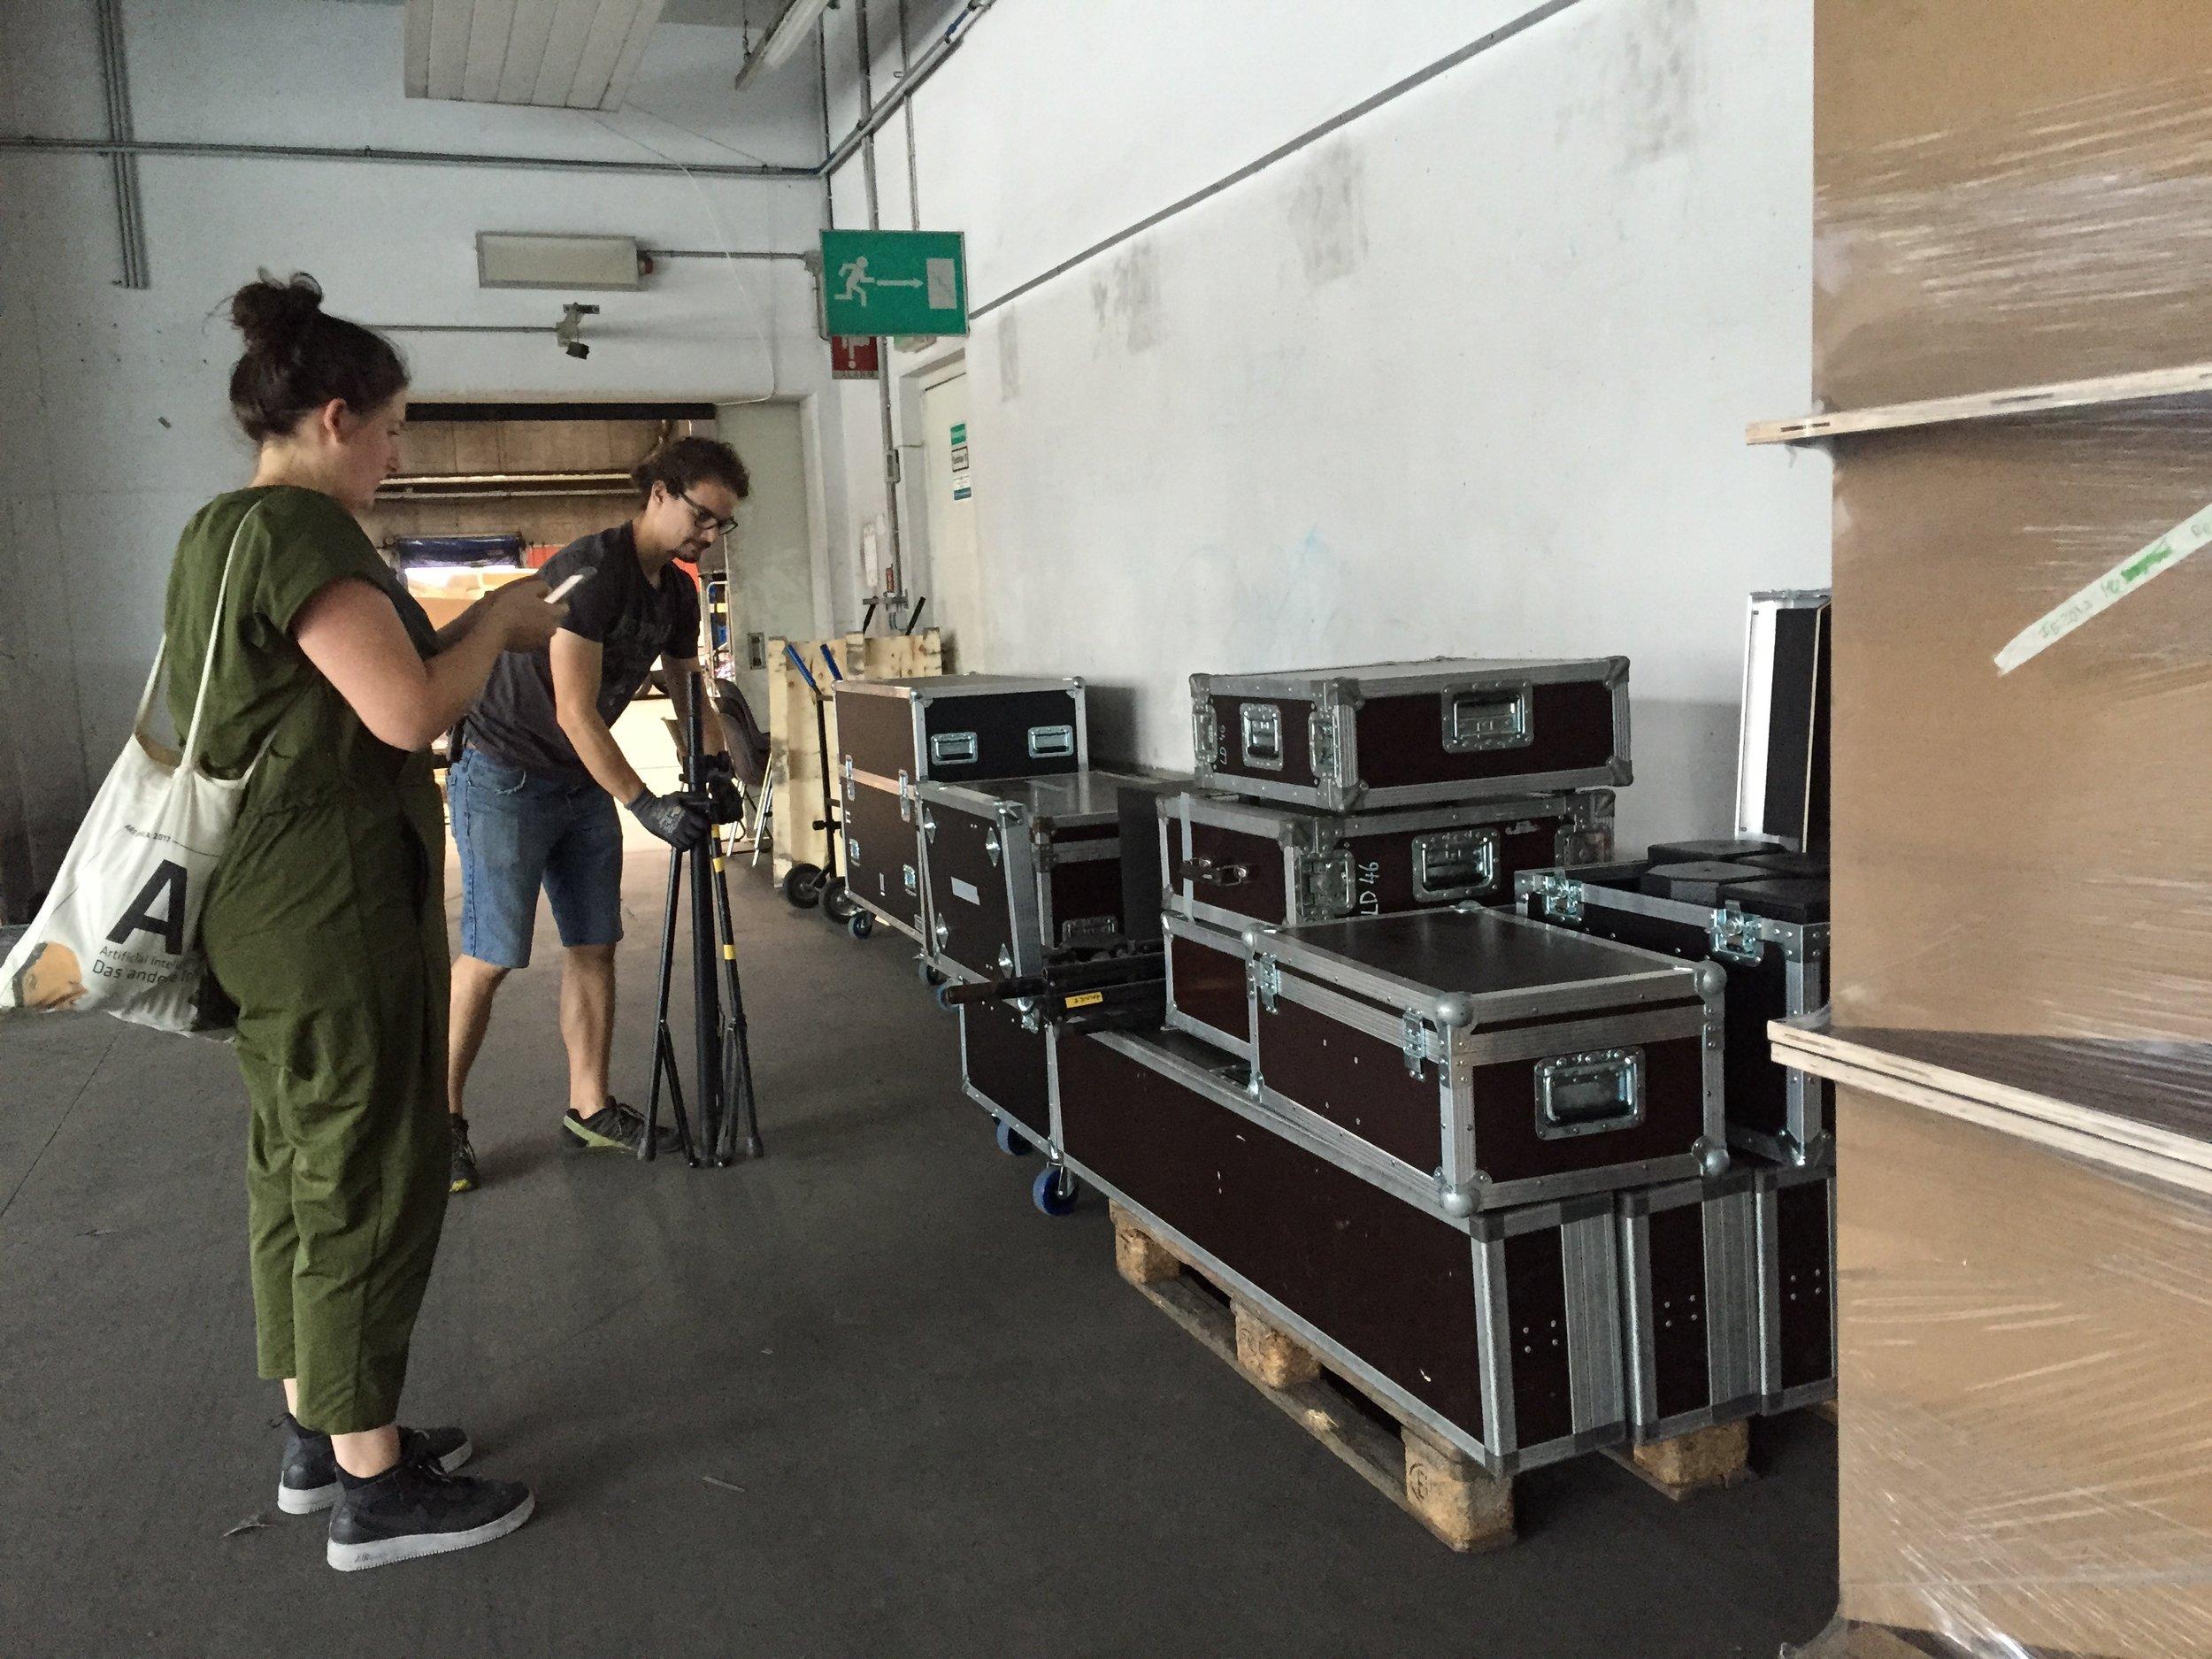 Checking equipment before installing